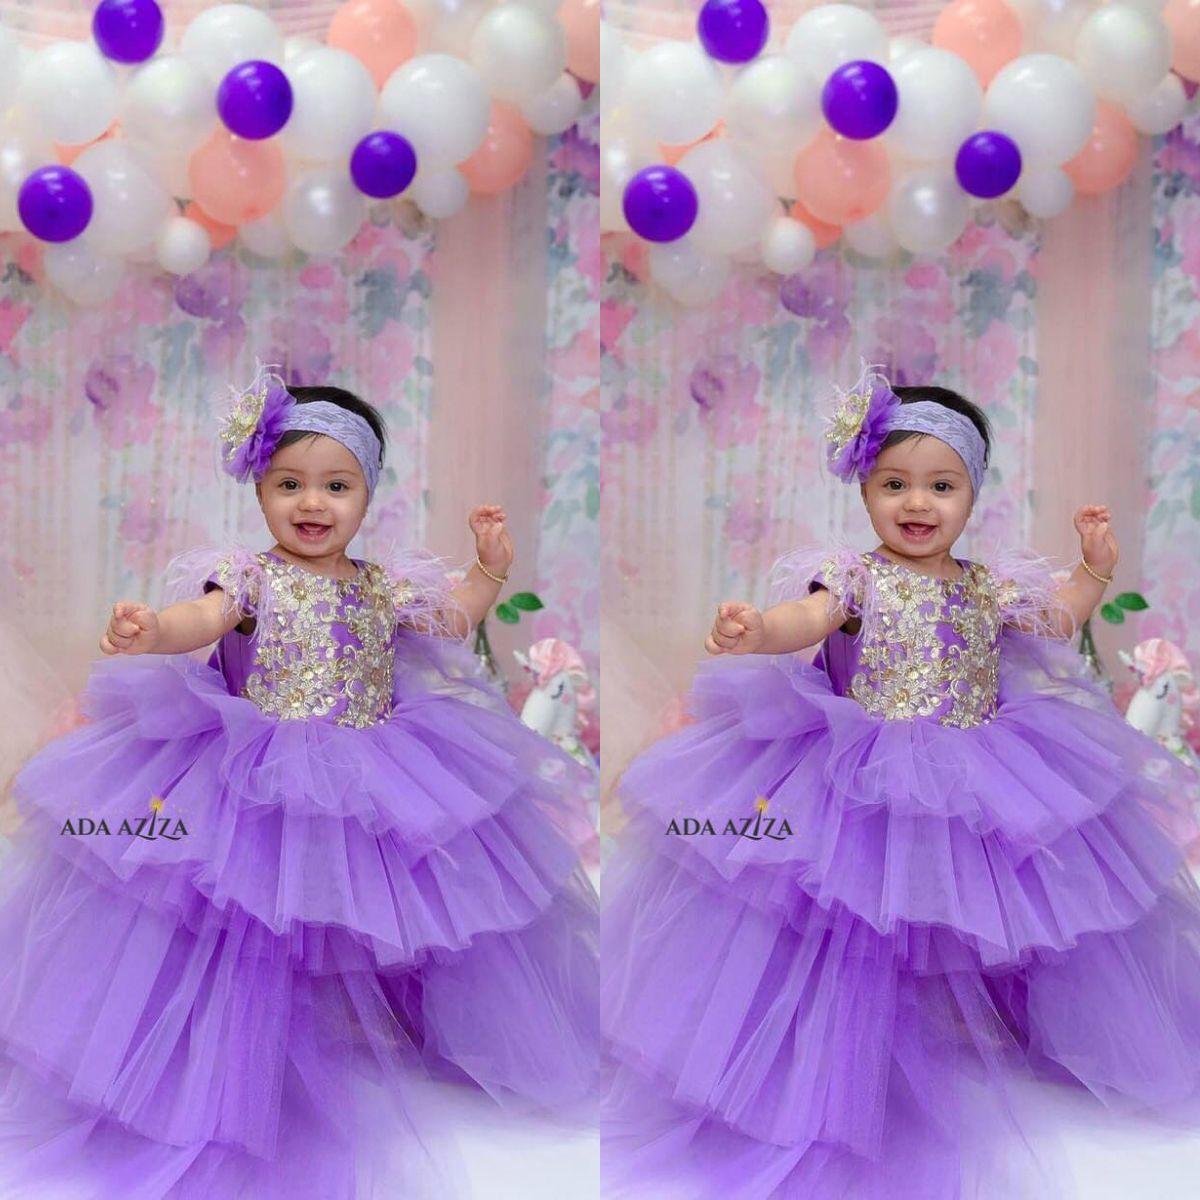 4786413d5 Flores púrpuras Vestidos para niñas Joya Encaje Apliques Lentejuelas Plumas  Faldas escalonadas Volantes Niños Vestidos de fiesta Vestido de fiesta ...